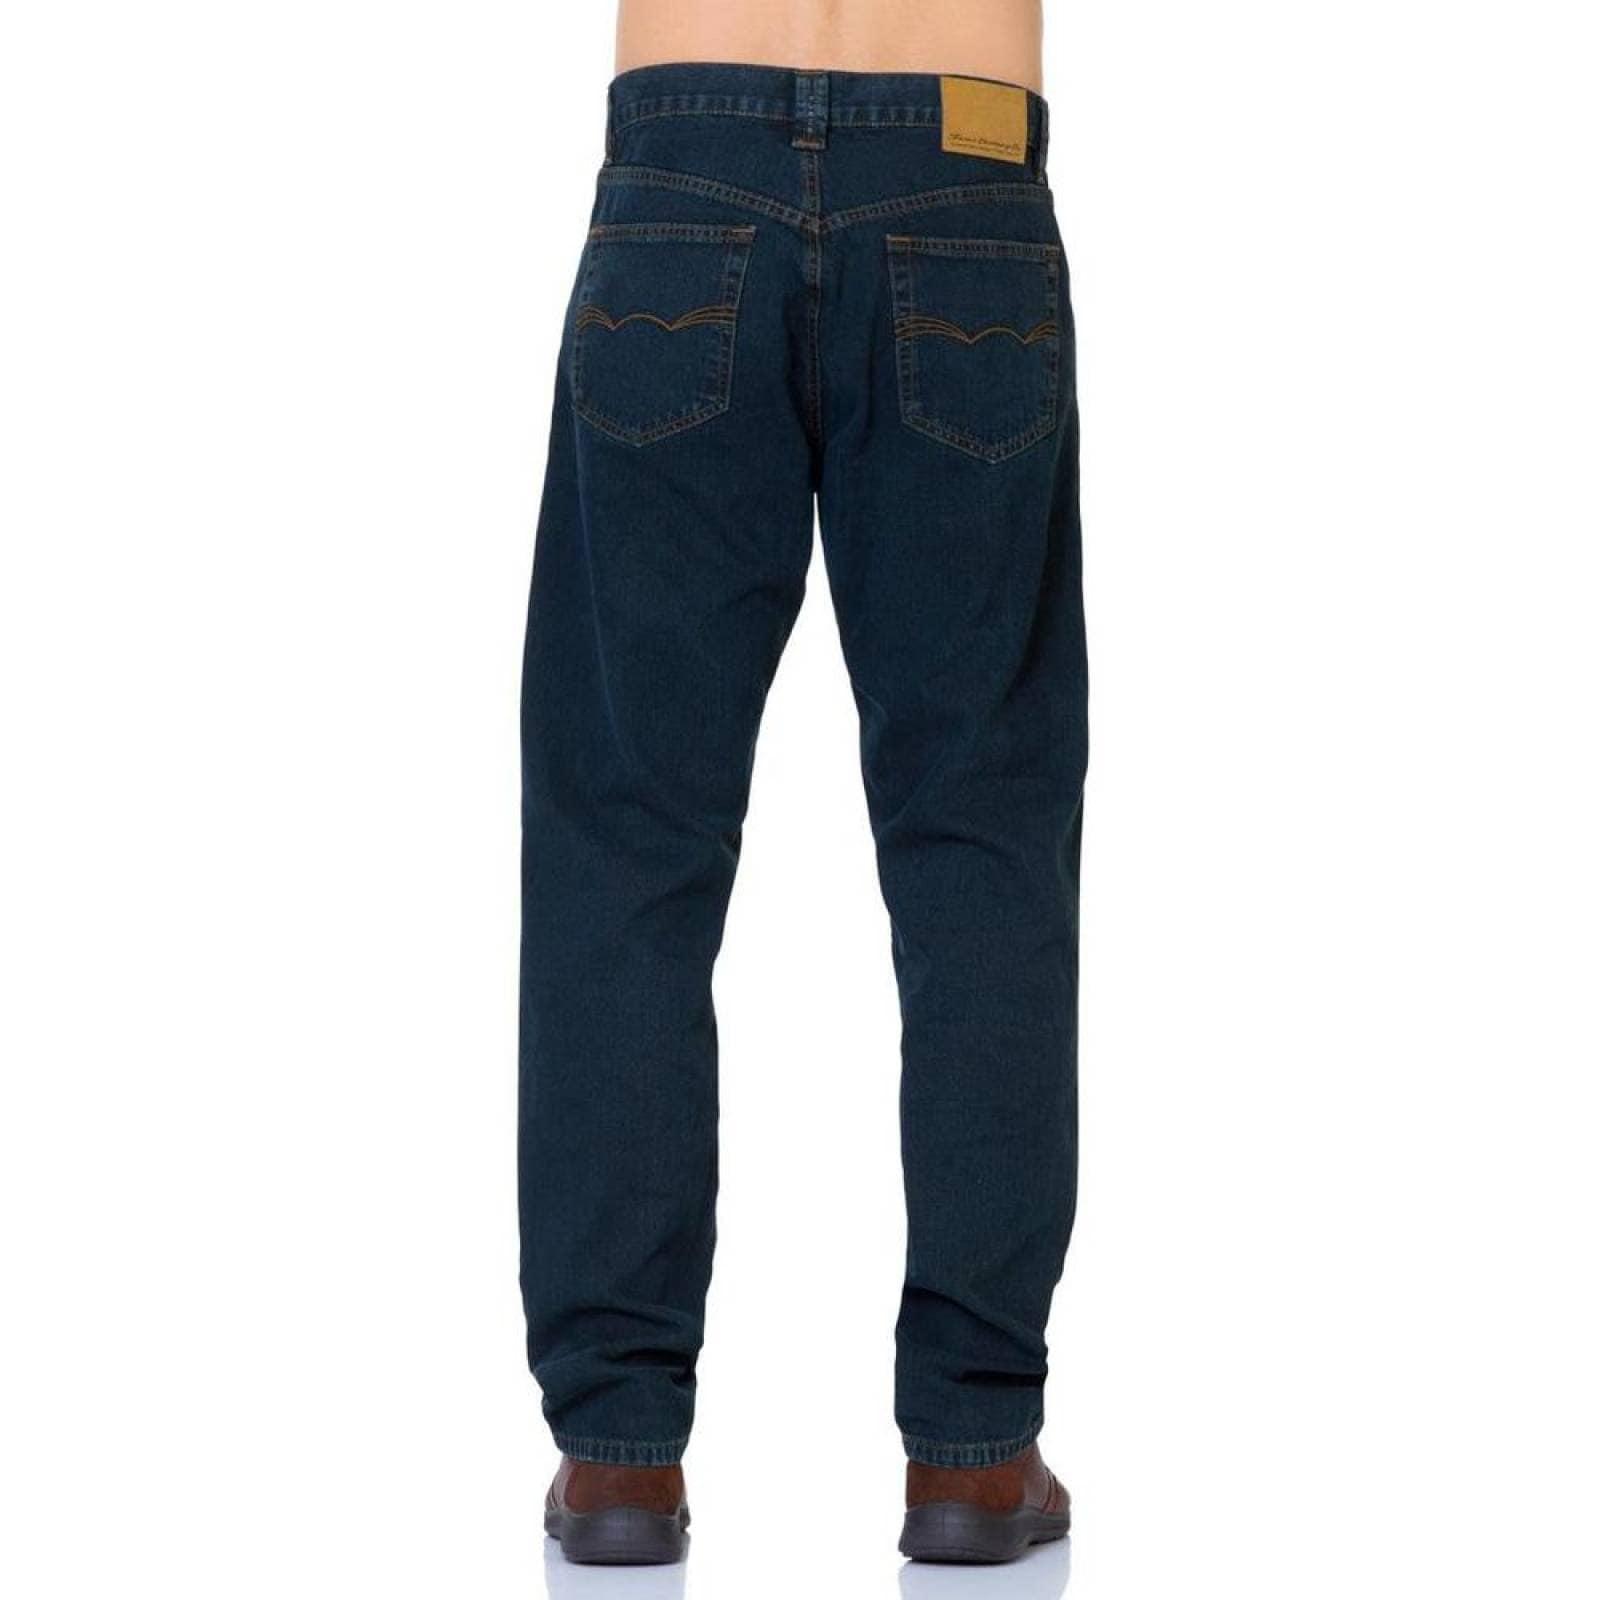 Jeans Basico Hombre Furor Over 62103349 Mezclilla